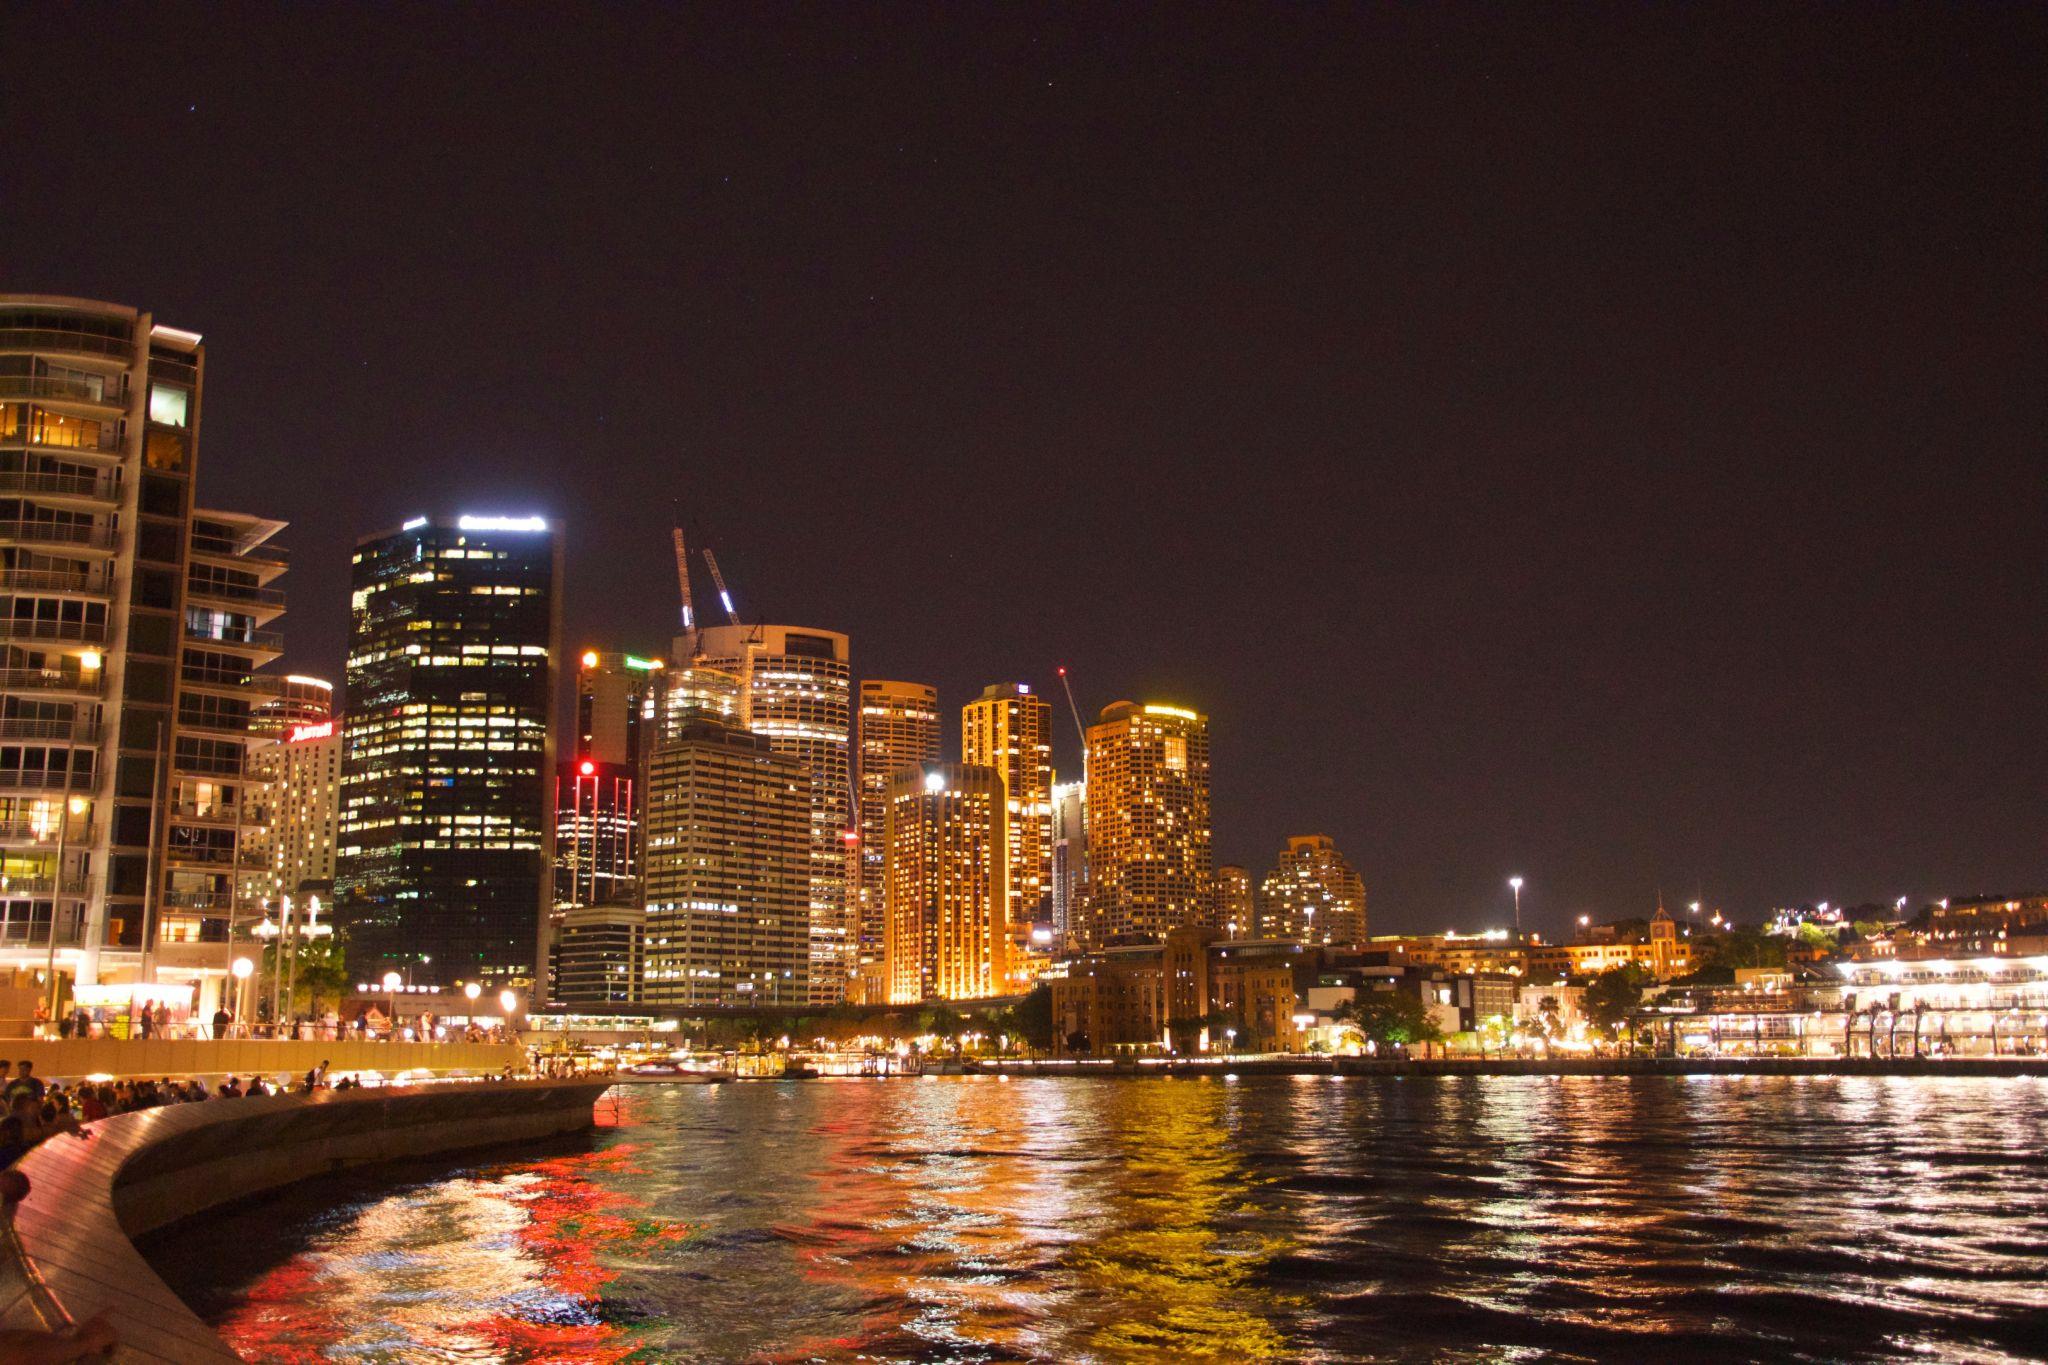 Sydney Harbour at night, Australia